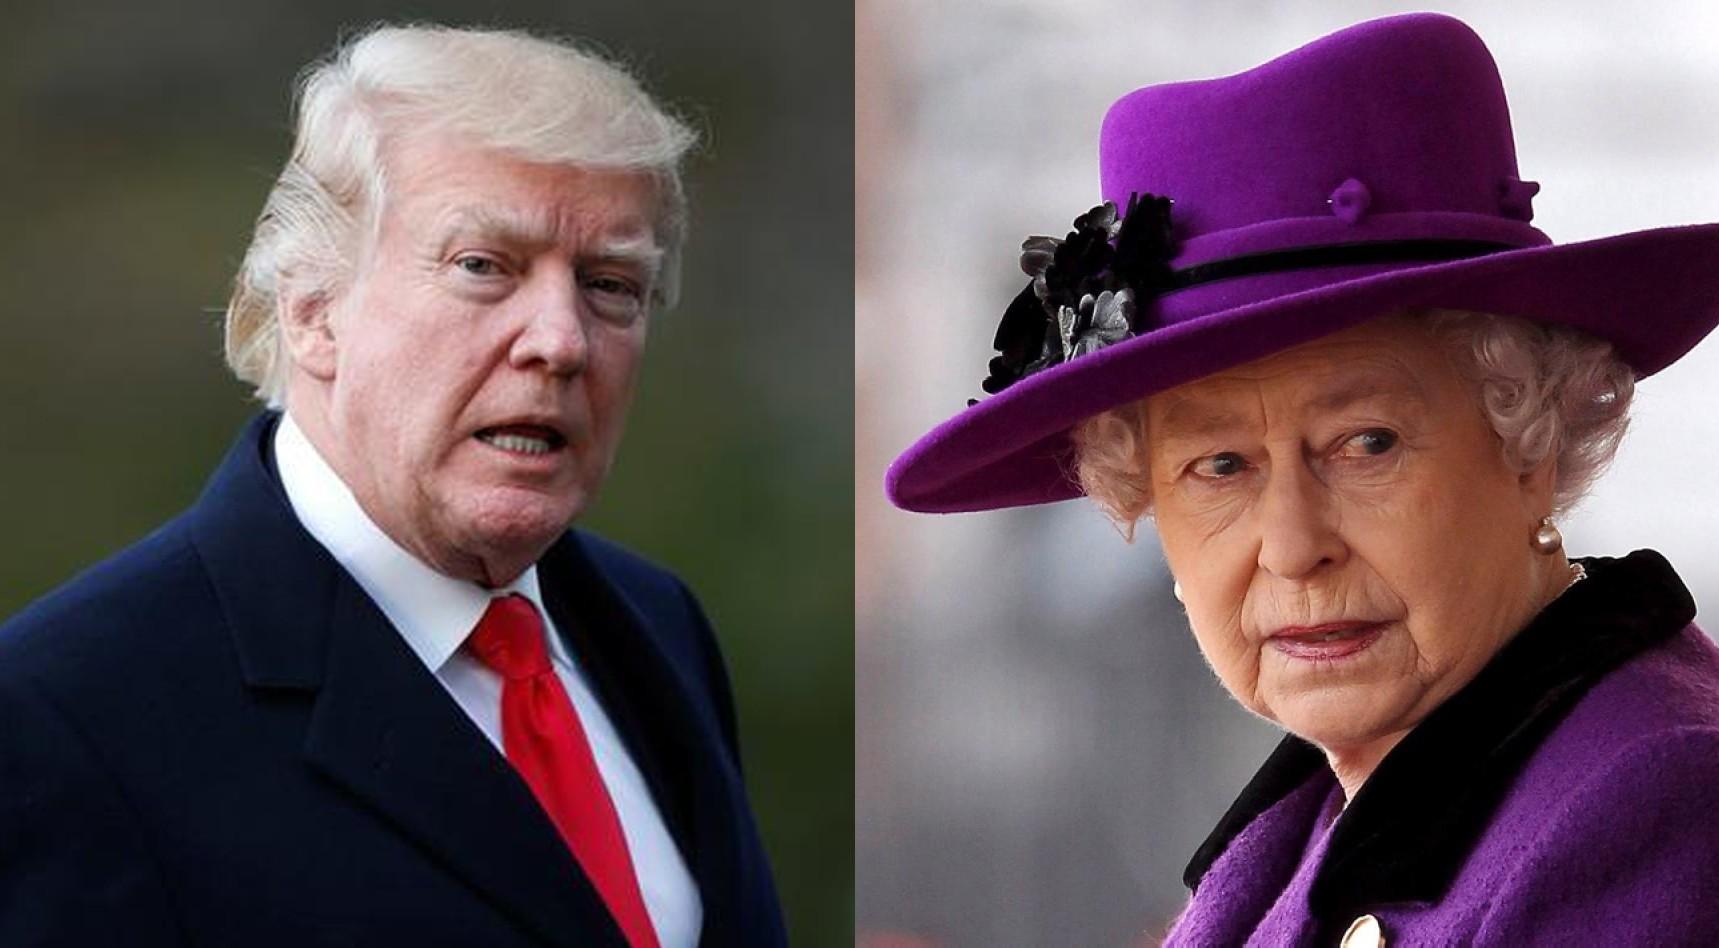 Trump (L) and Queen Elizabeth II